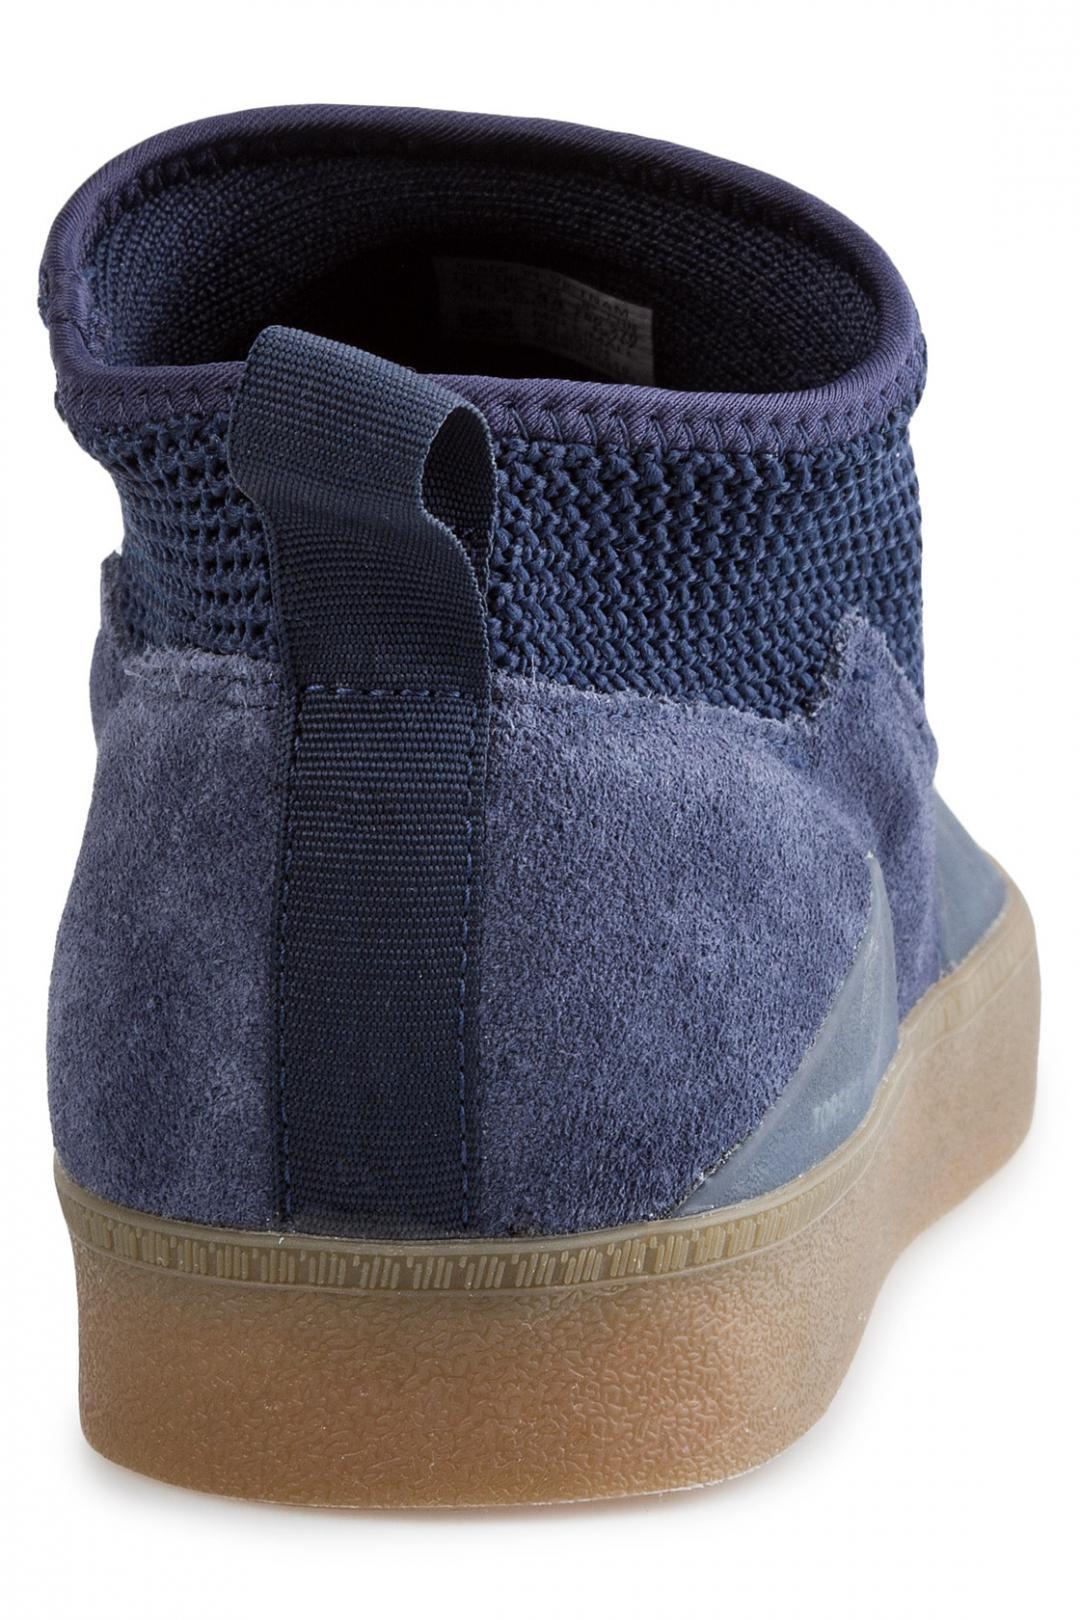 Uomo adidas Skateboarding 3ST.002 navy white gum | Sneakers low top